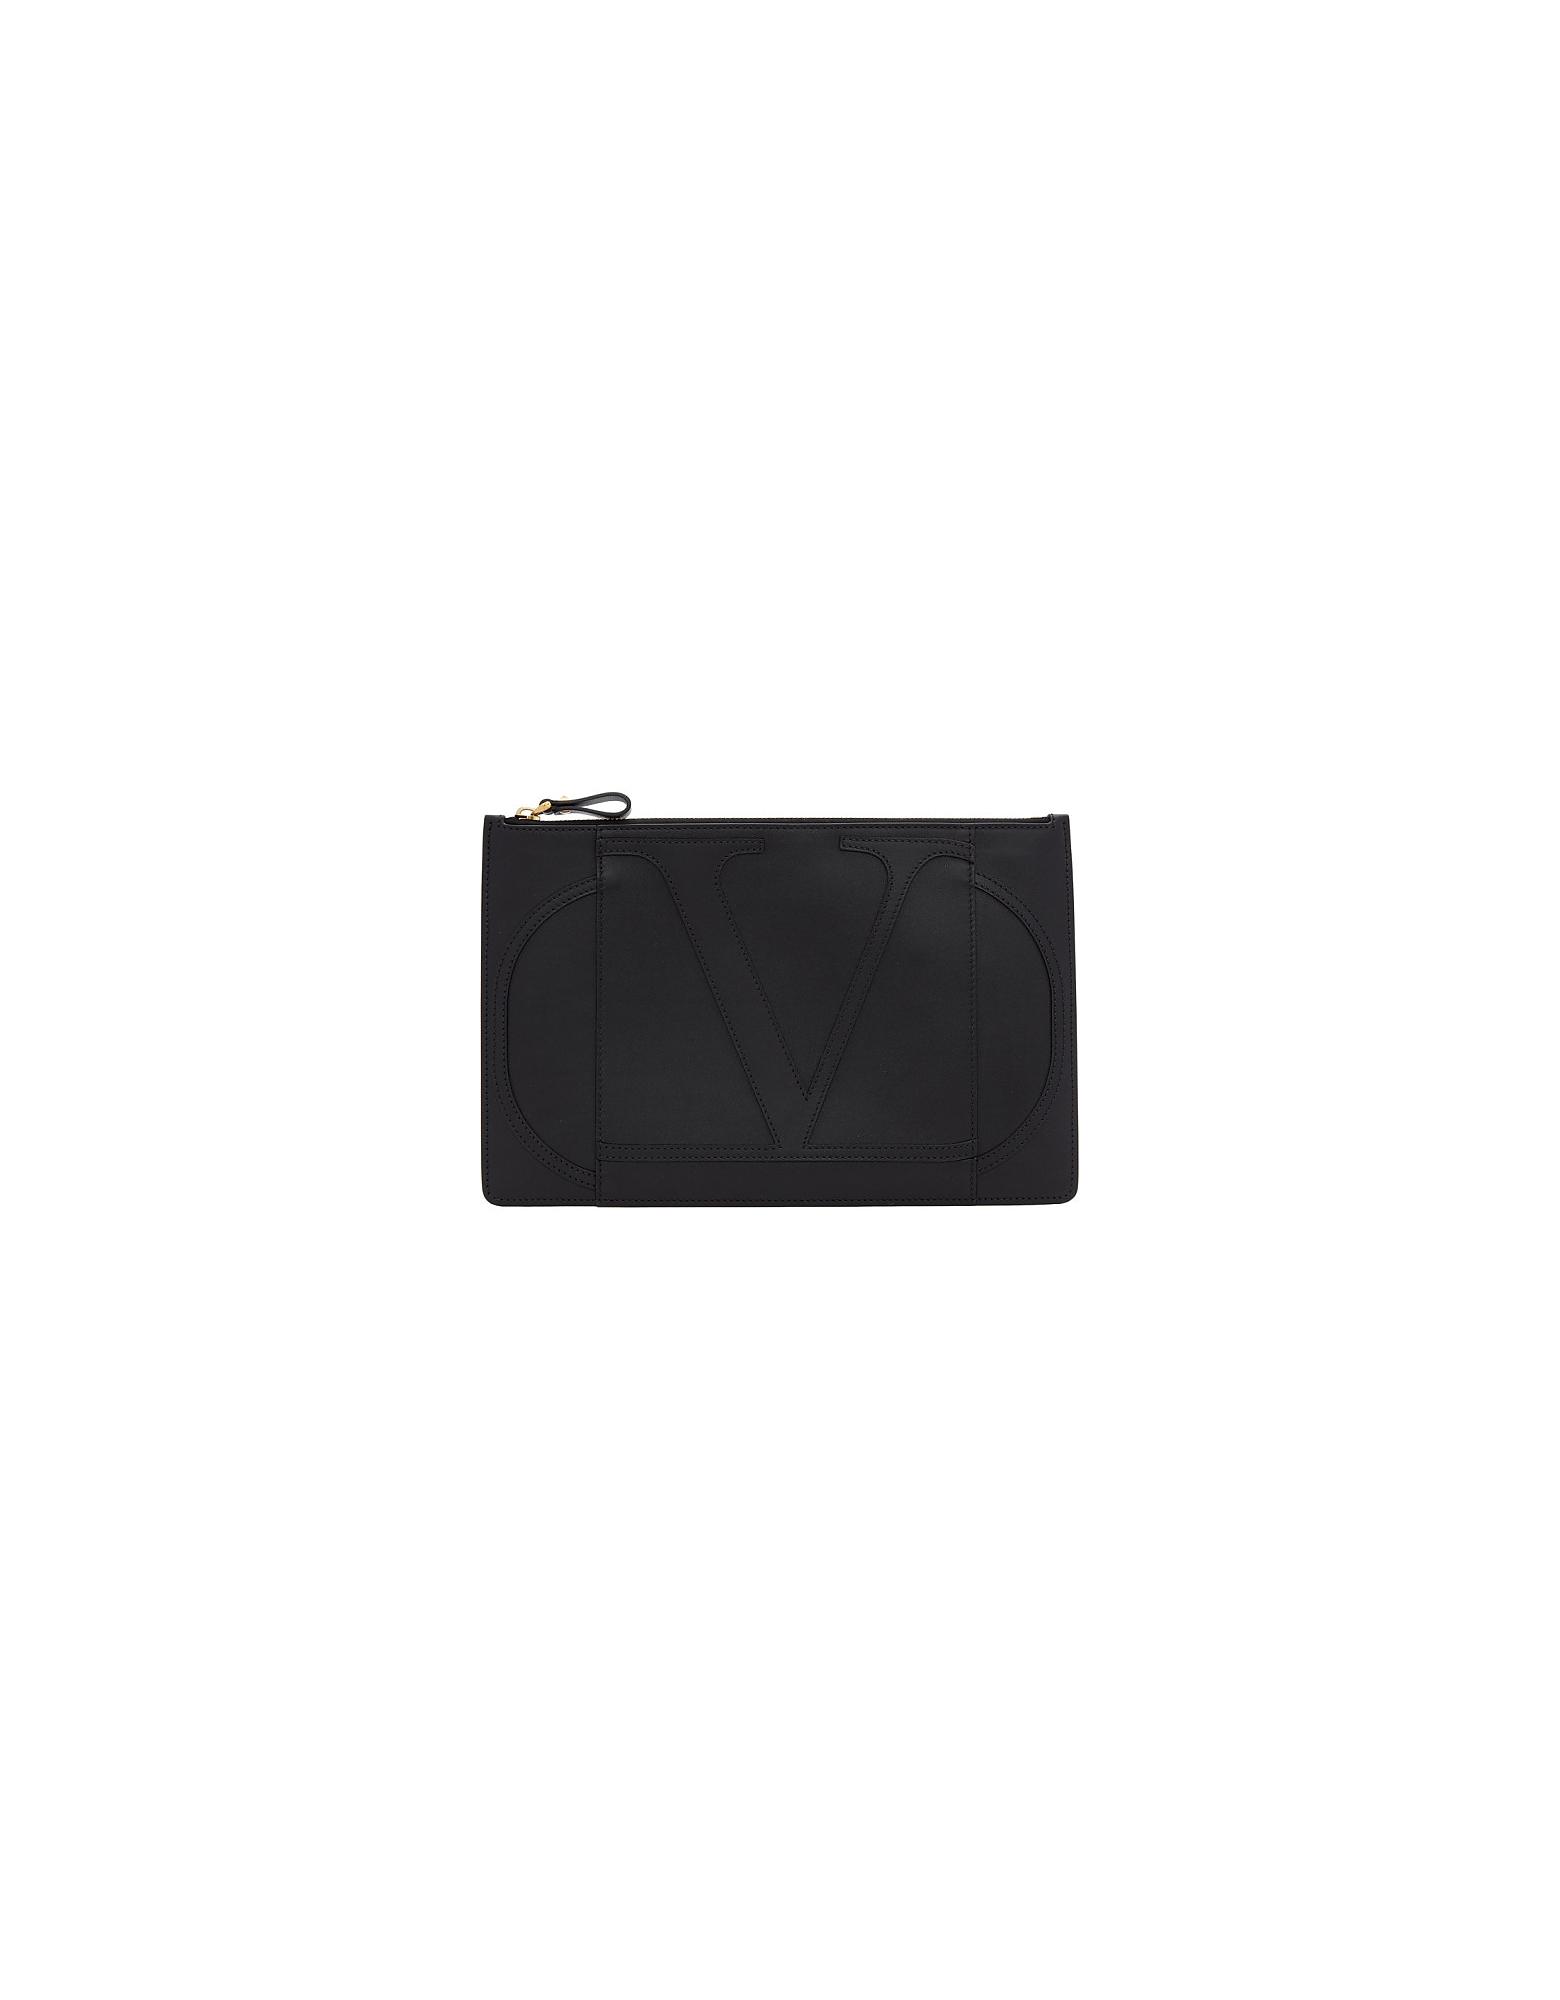 Valentino Designer Handbags, Black Valentino Garavani Large VLogo Pouch